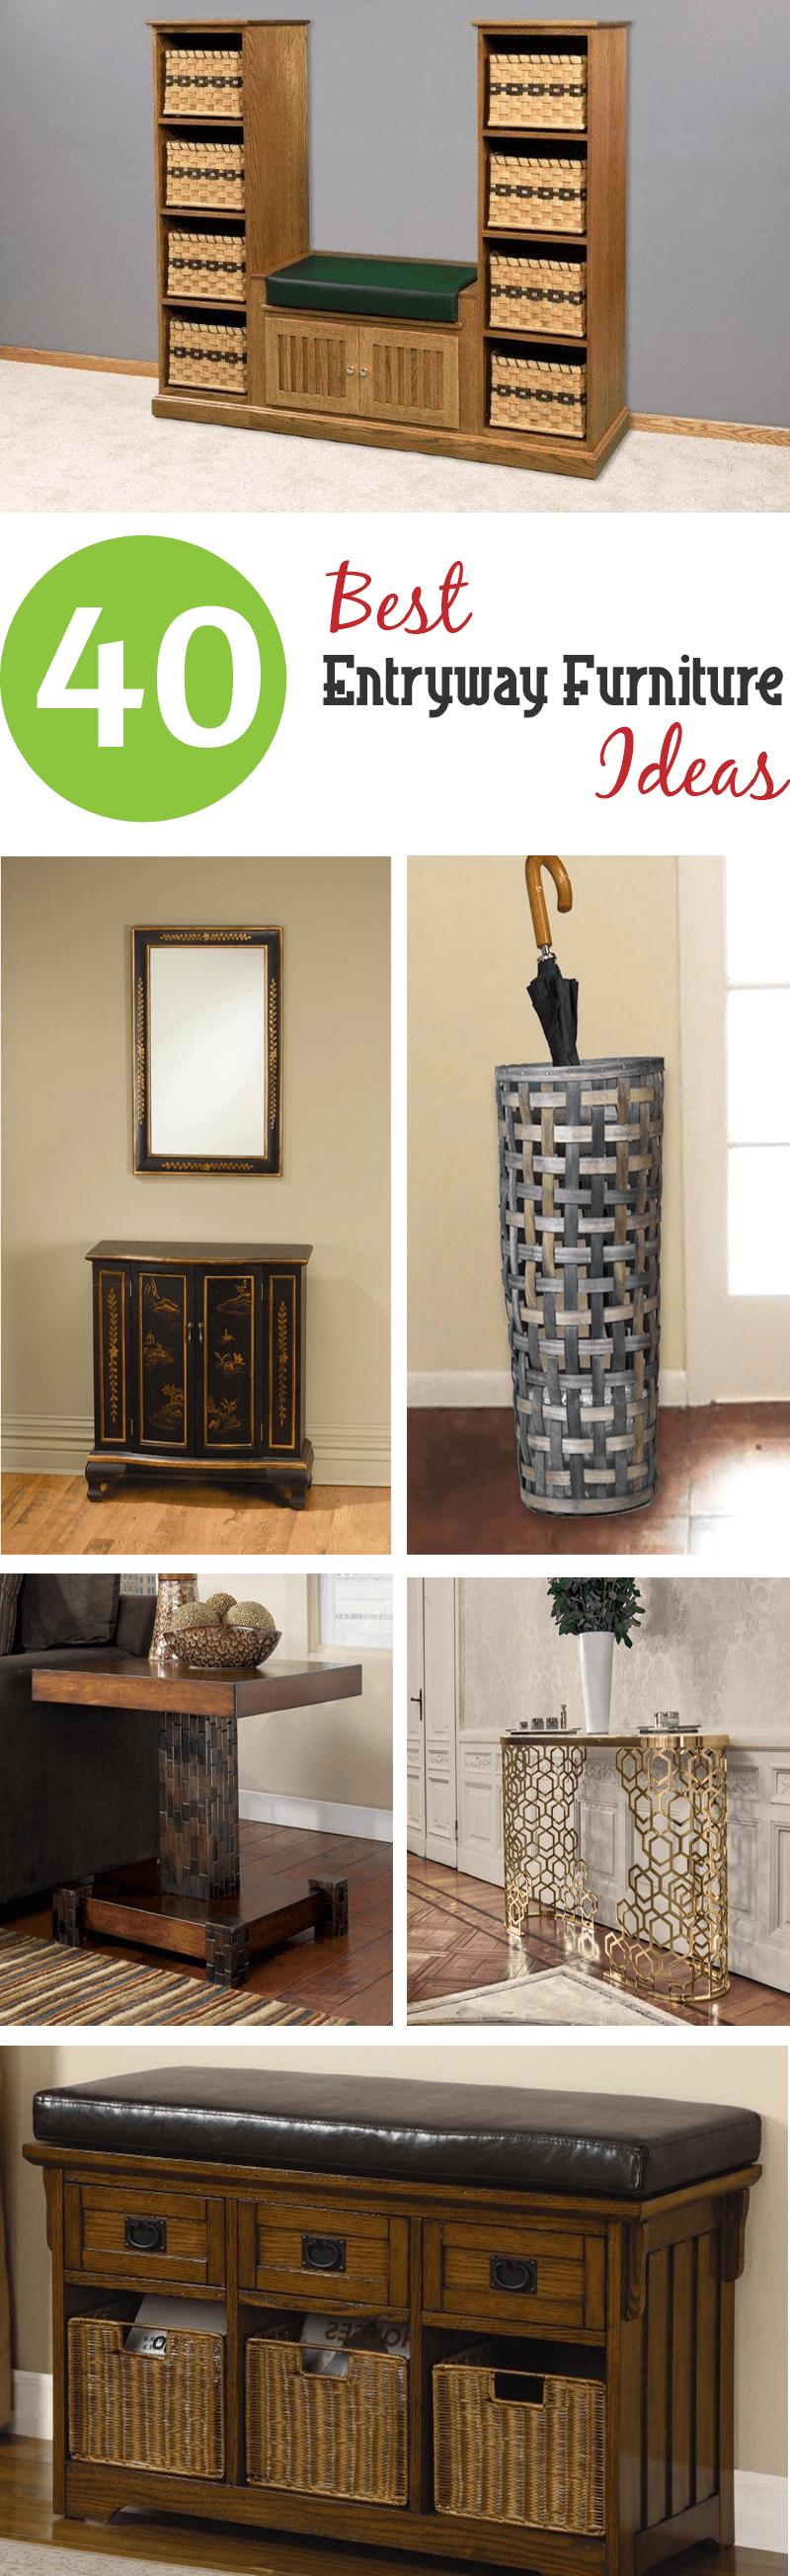 best entryway furniture